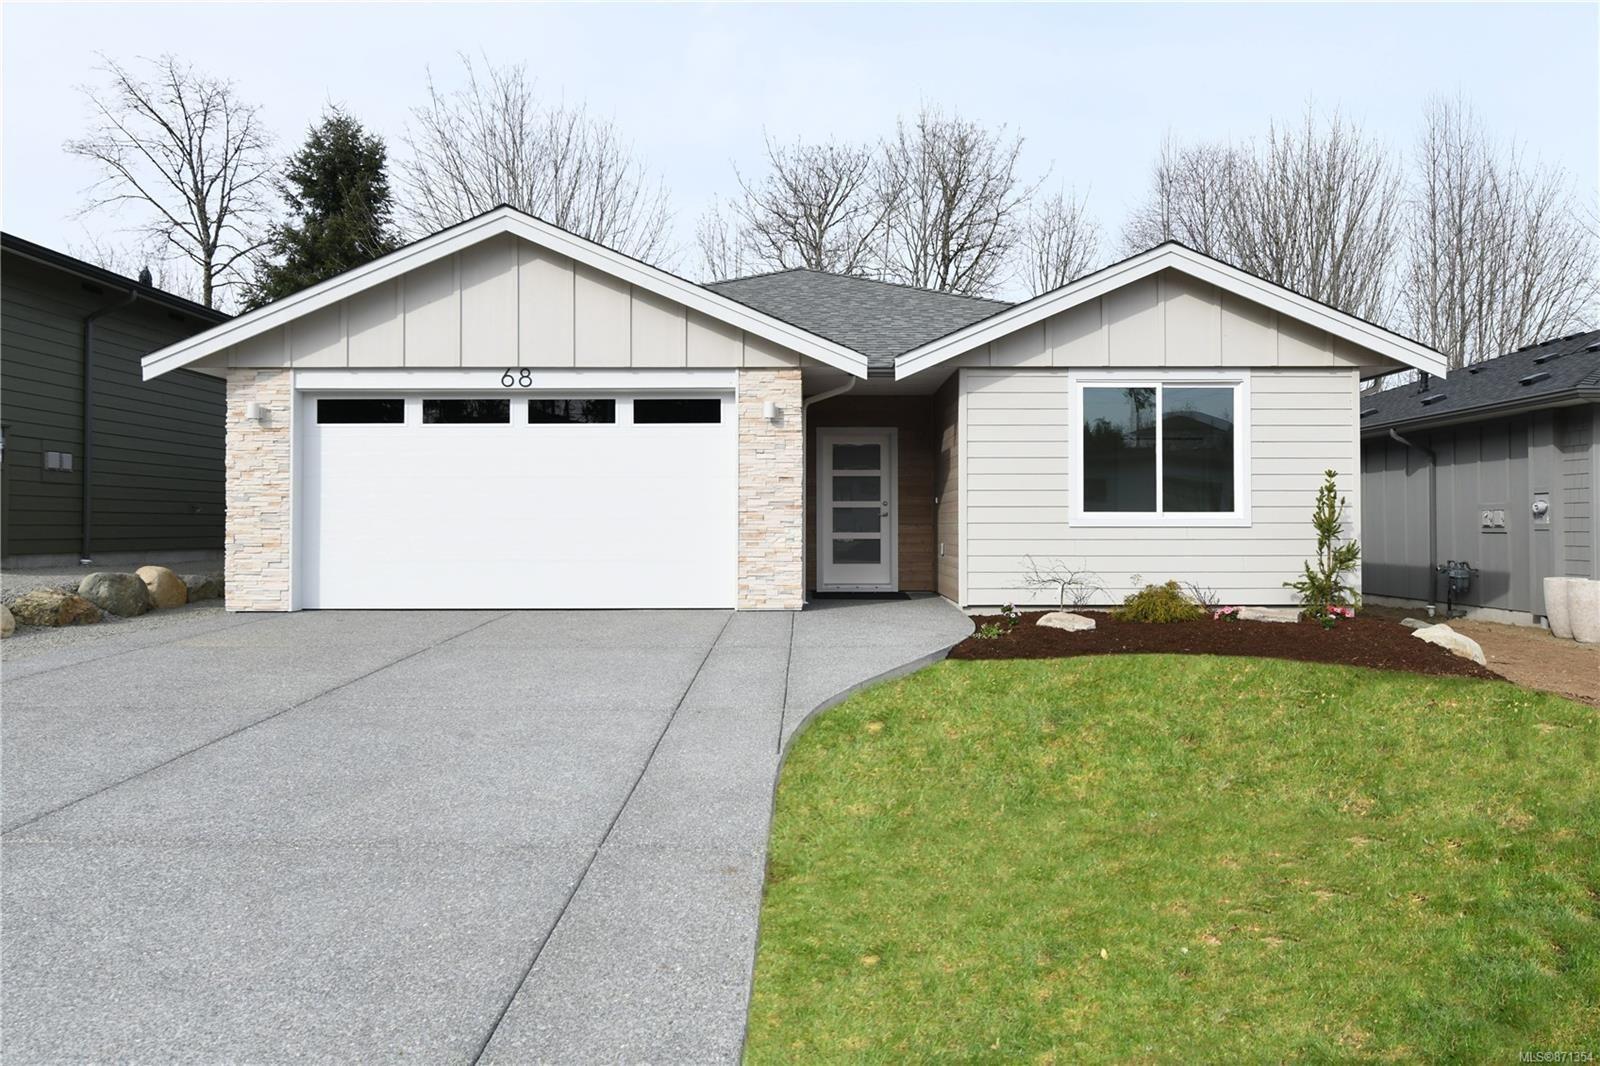 Photo 1: Photos: 68 Grayhawk Pl in : CV Courtenay City House for sale (Comox Valley)  : MLS®# 871354